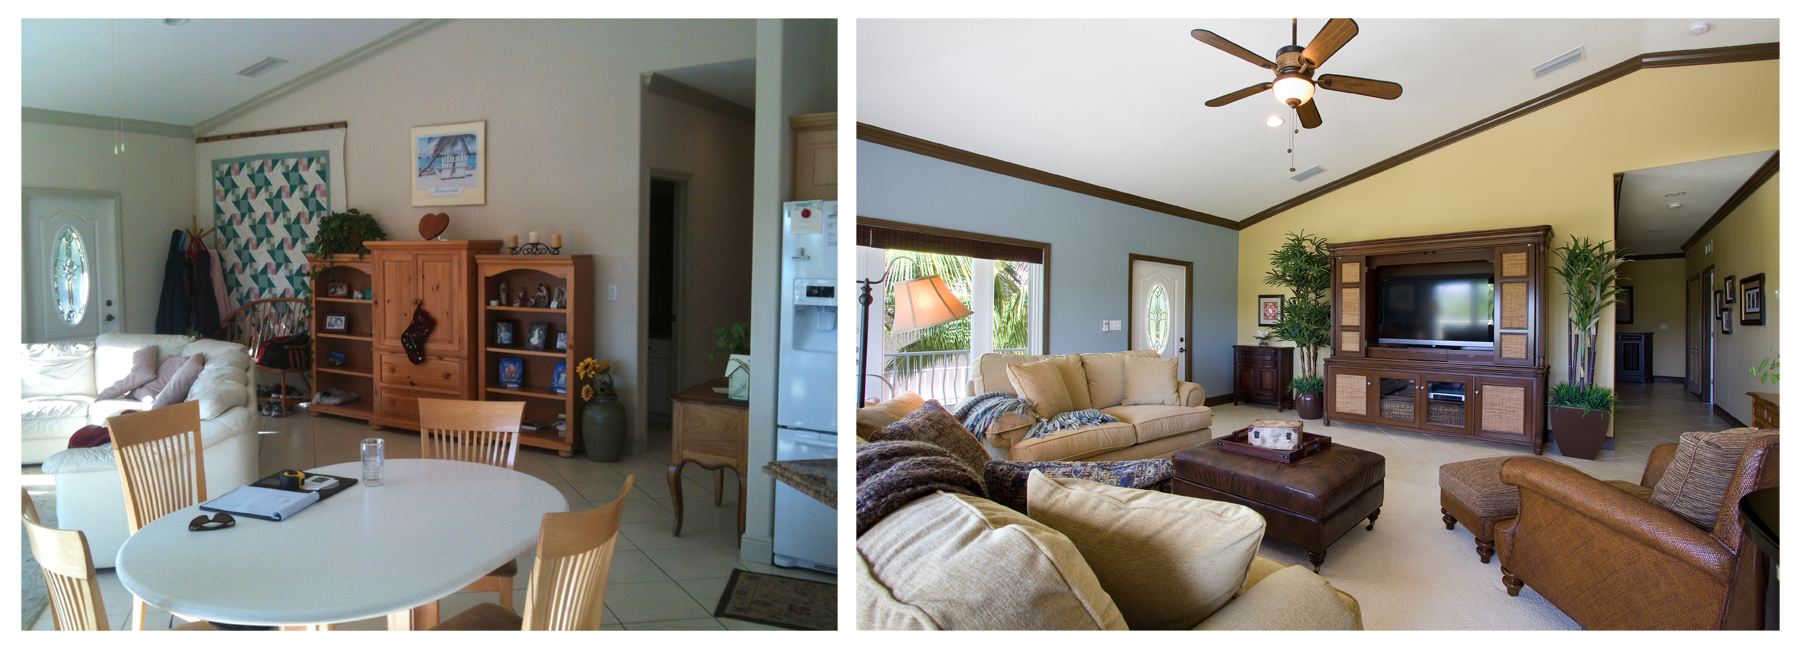 Ihrig Living Room.jpg